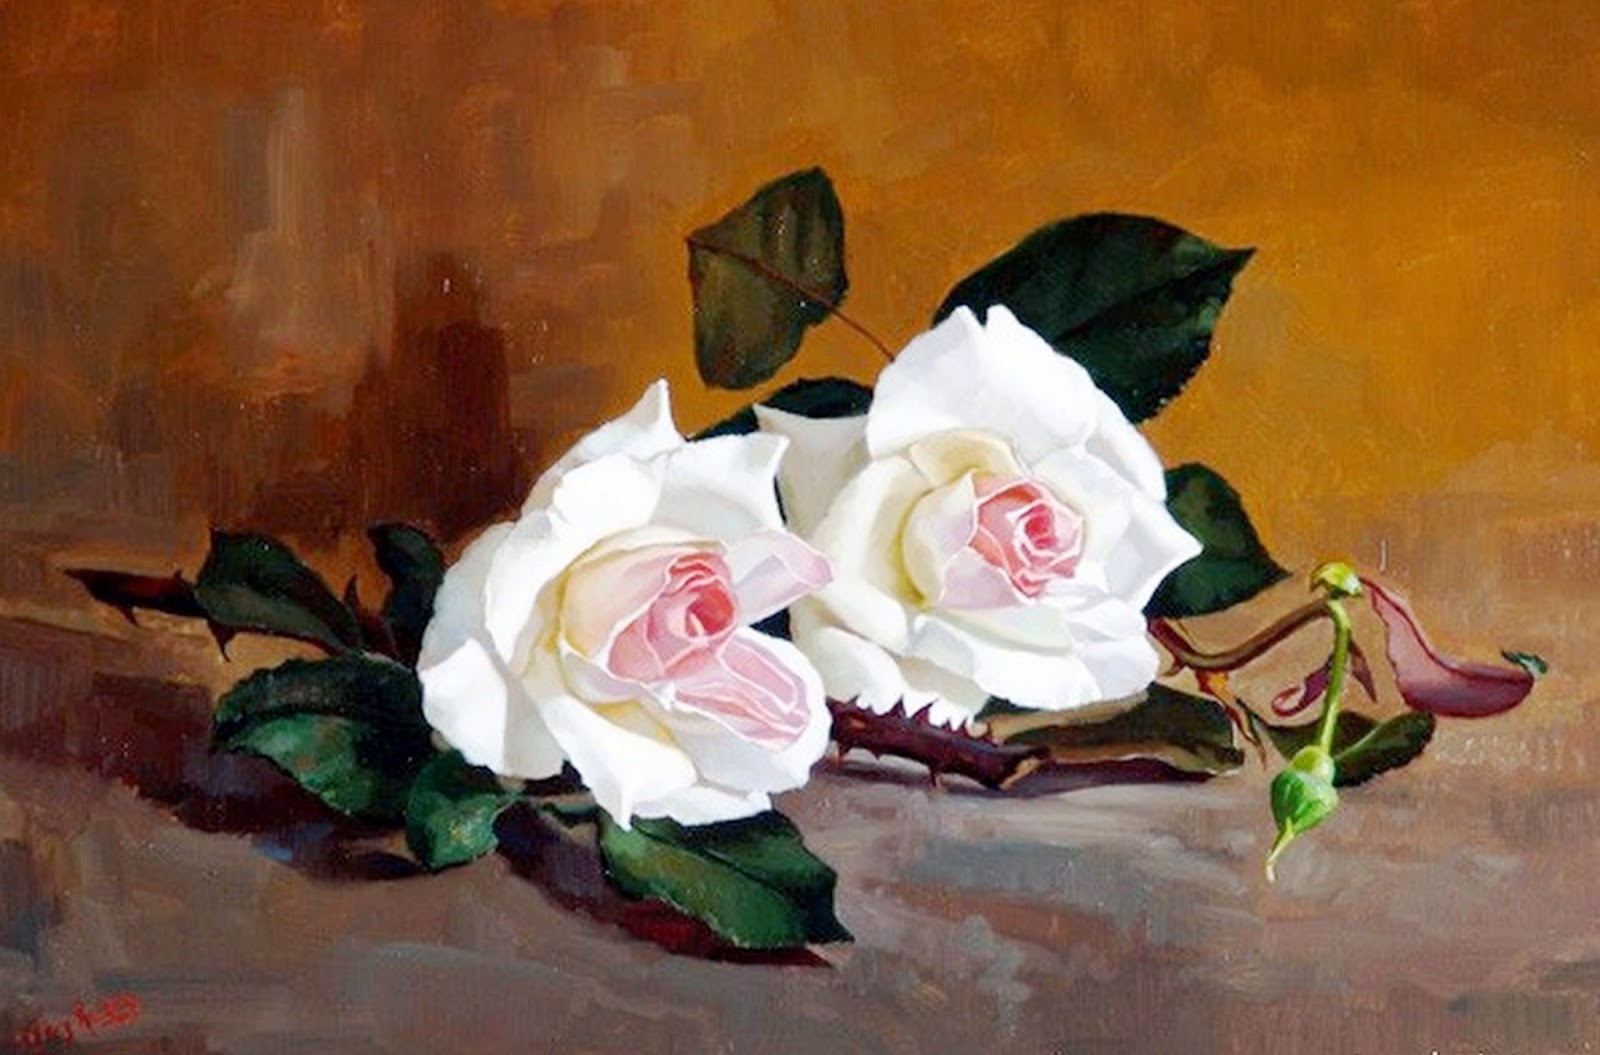 bodegones-con-flores-pintadas-en-realismo